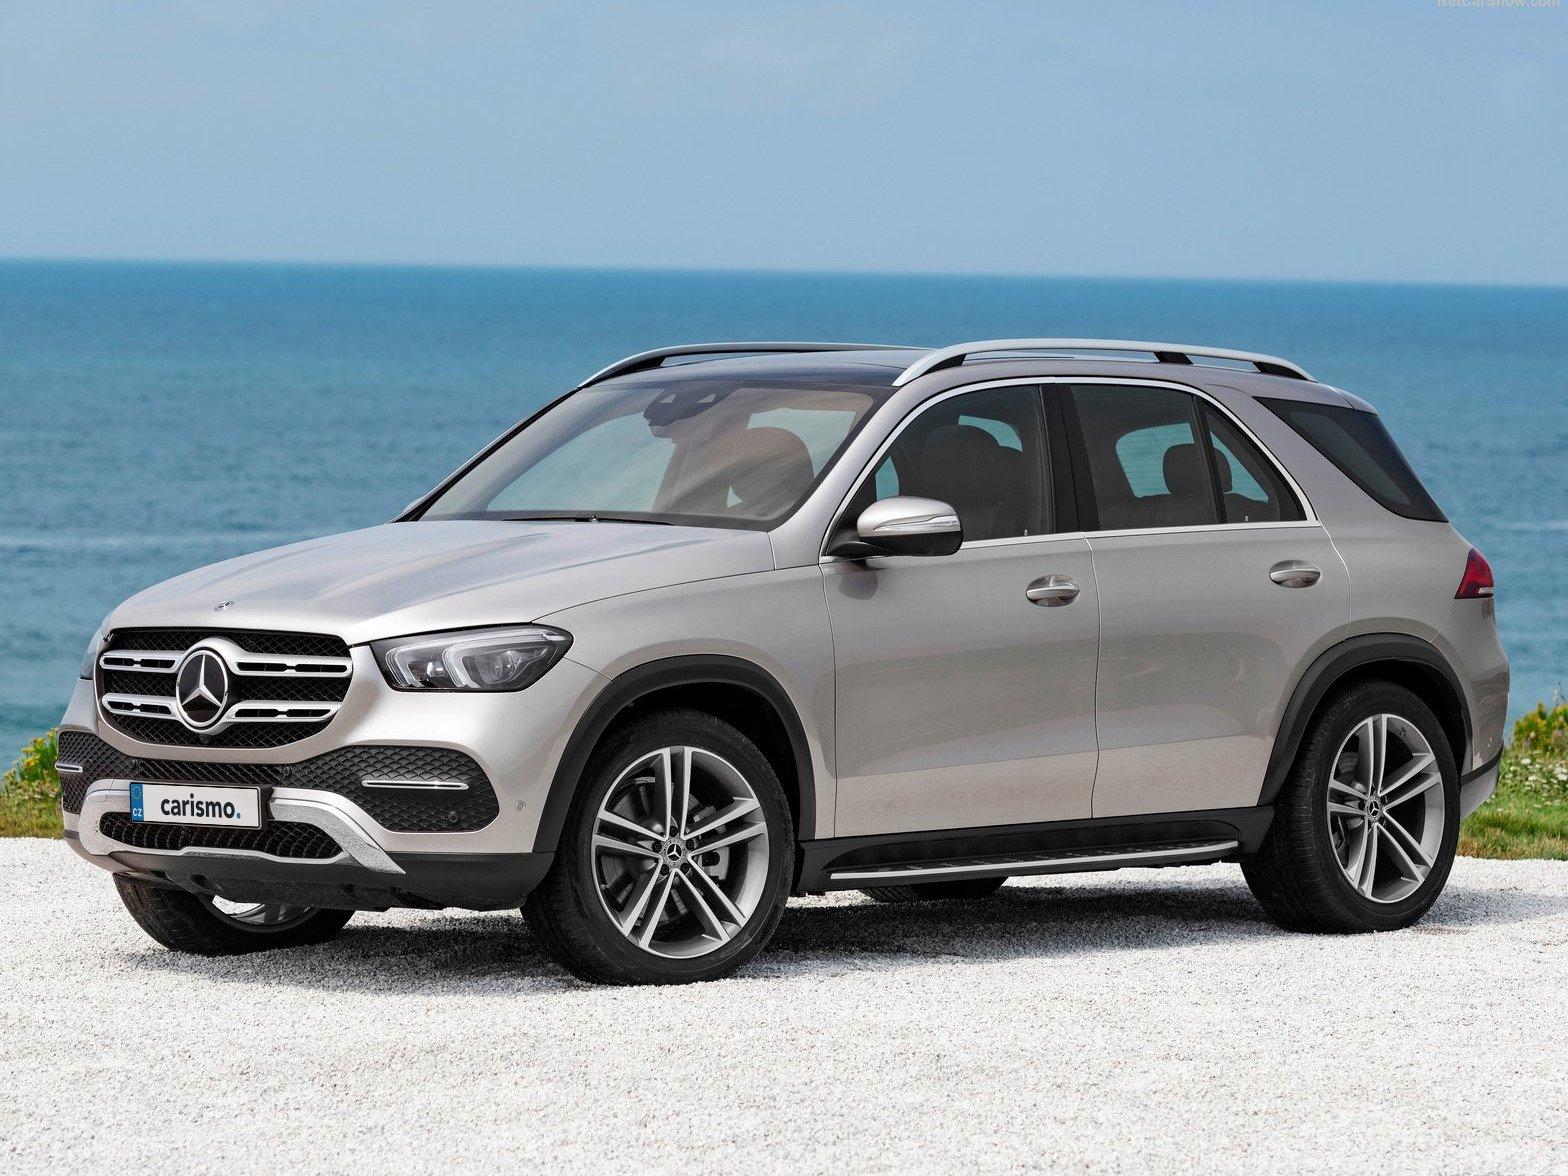 Mercedes-Benz GLE - recenze a ceny | Carismo.cz